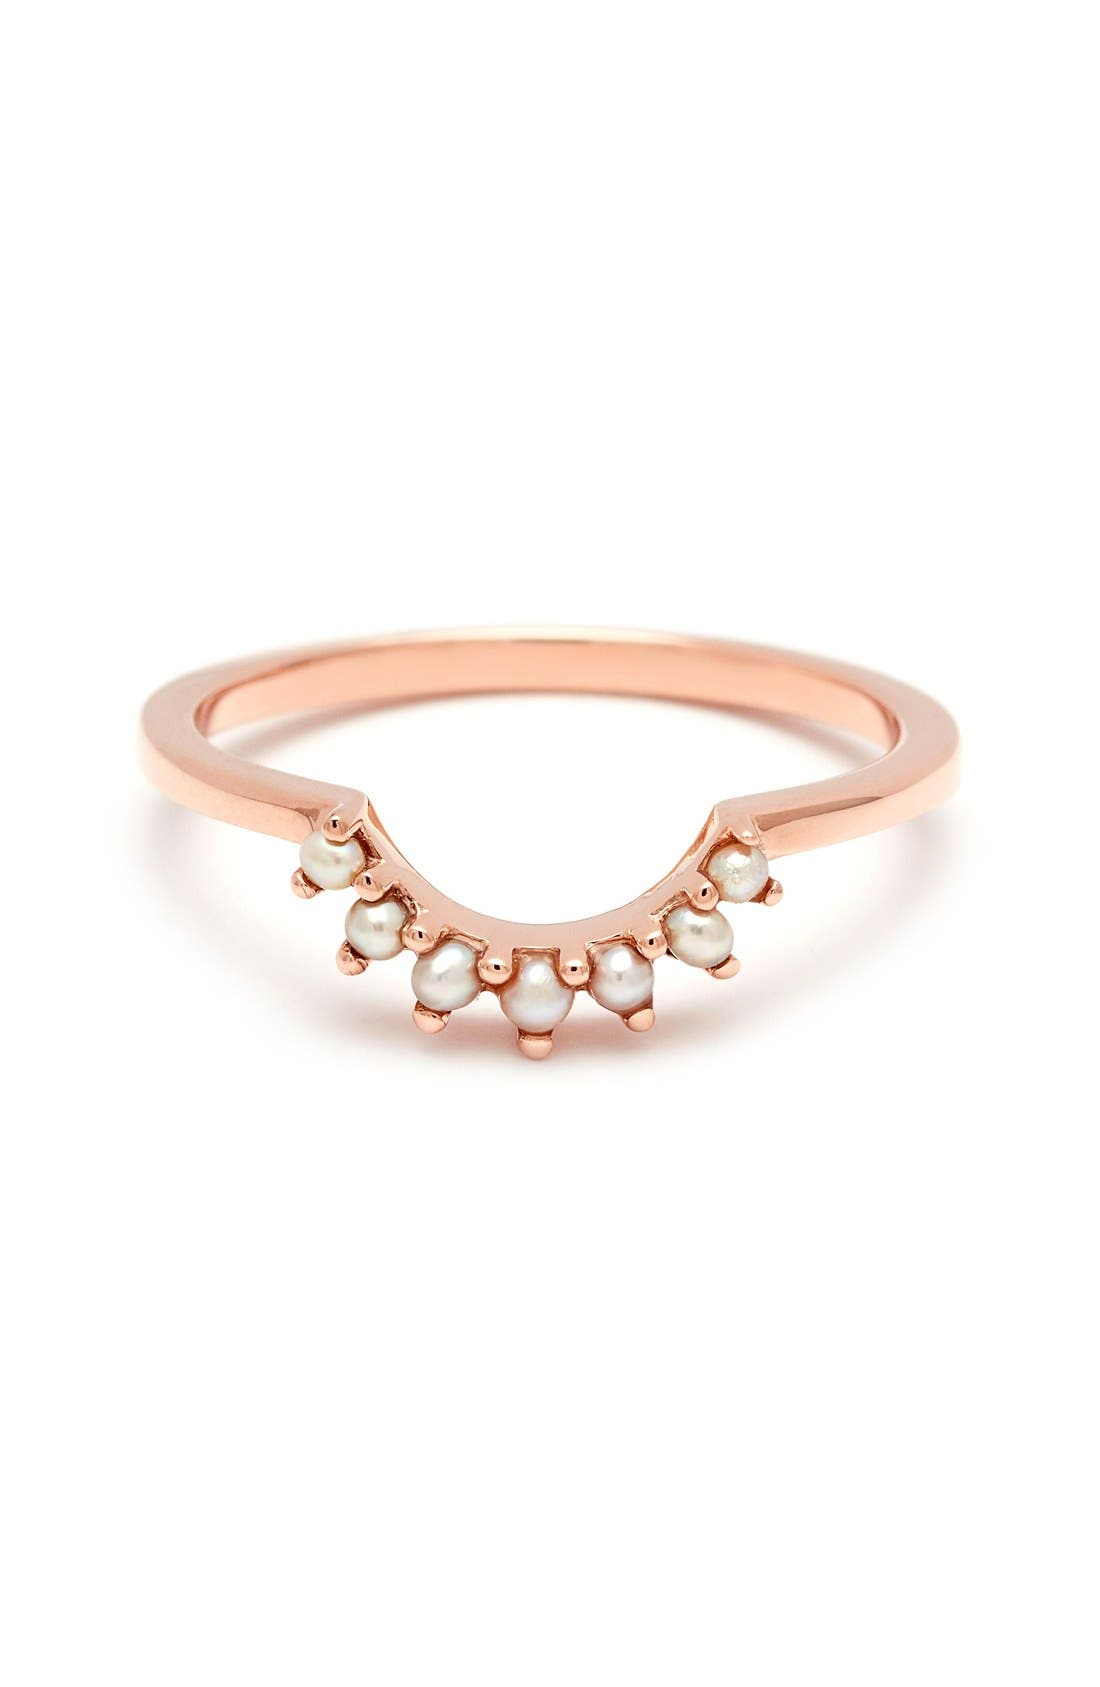 'Grand Tiara' Seed Pearl Ring,                             Main thumbnail 1, color,                             ROSE/ GOLD/ CHAMPAGNE